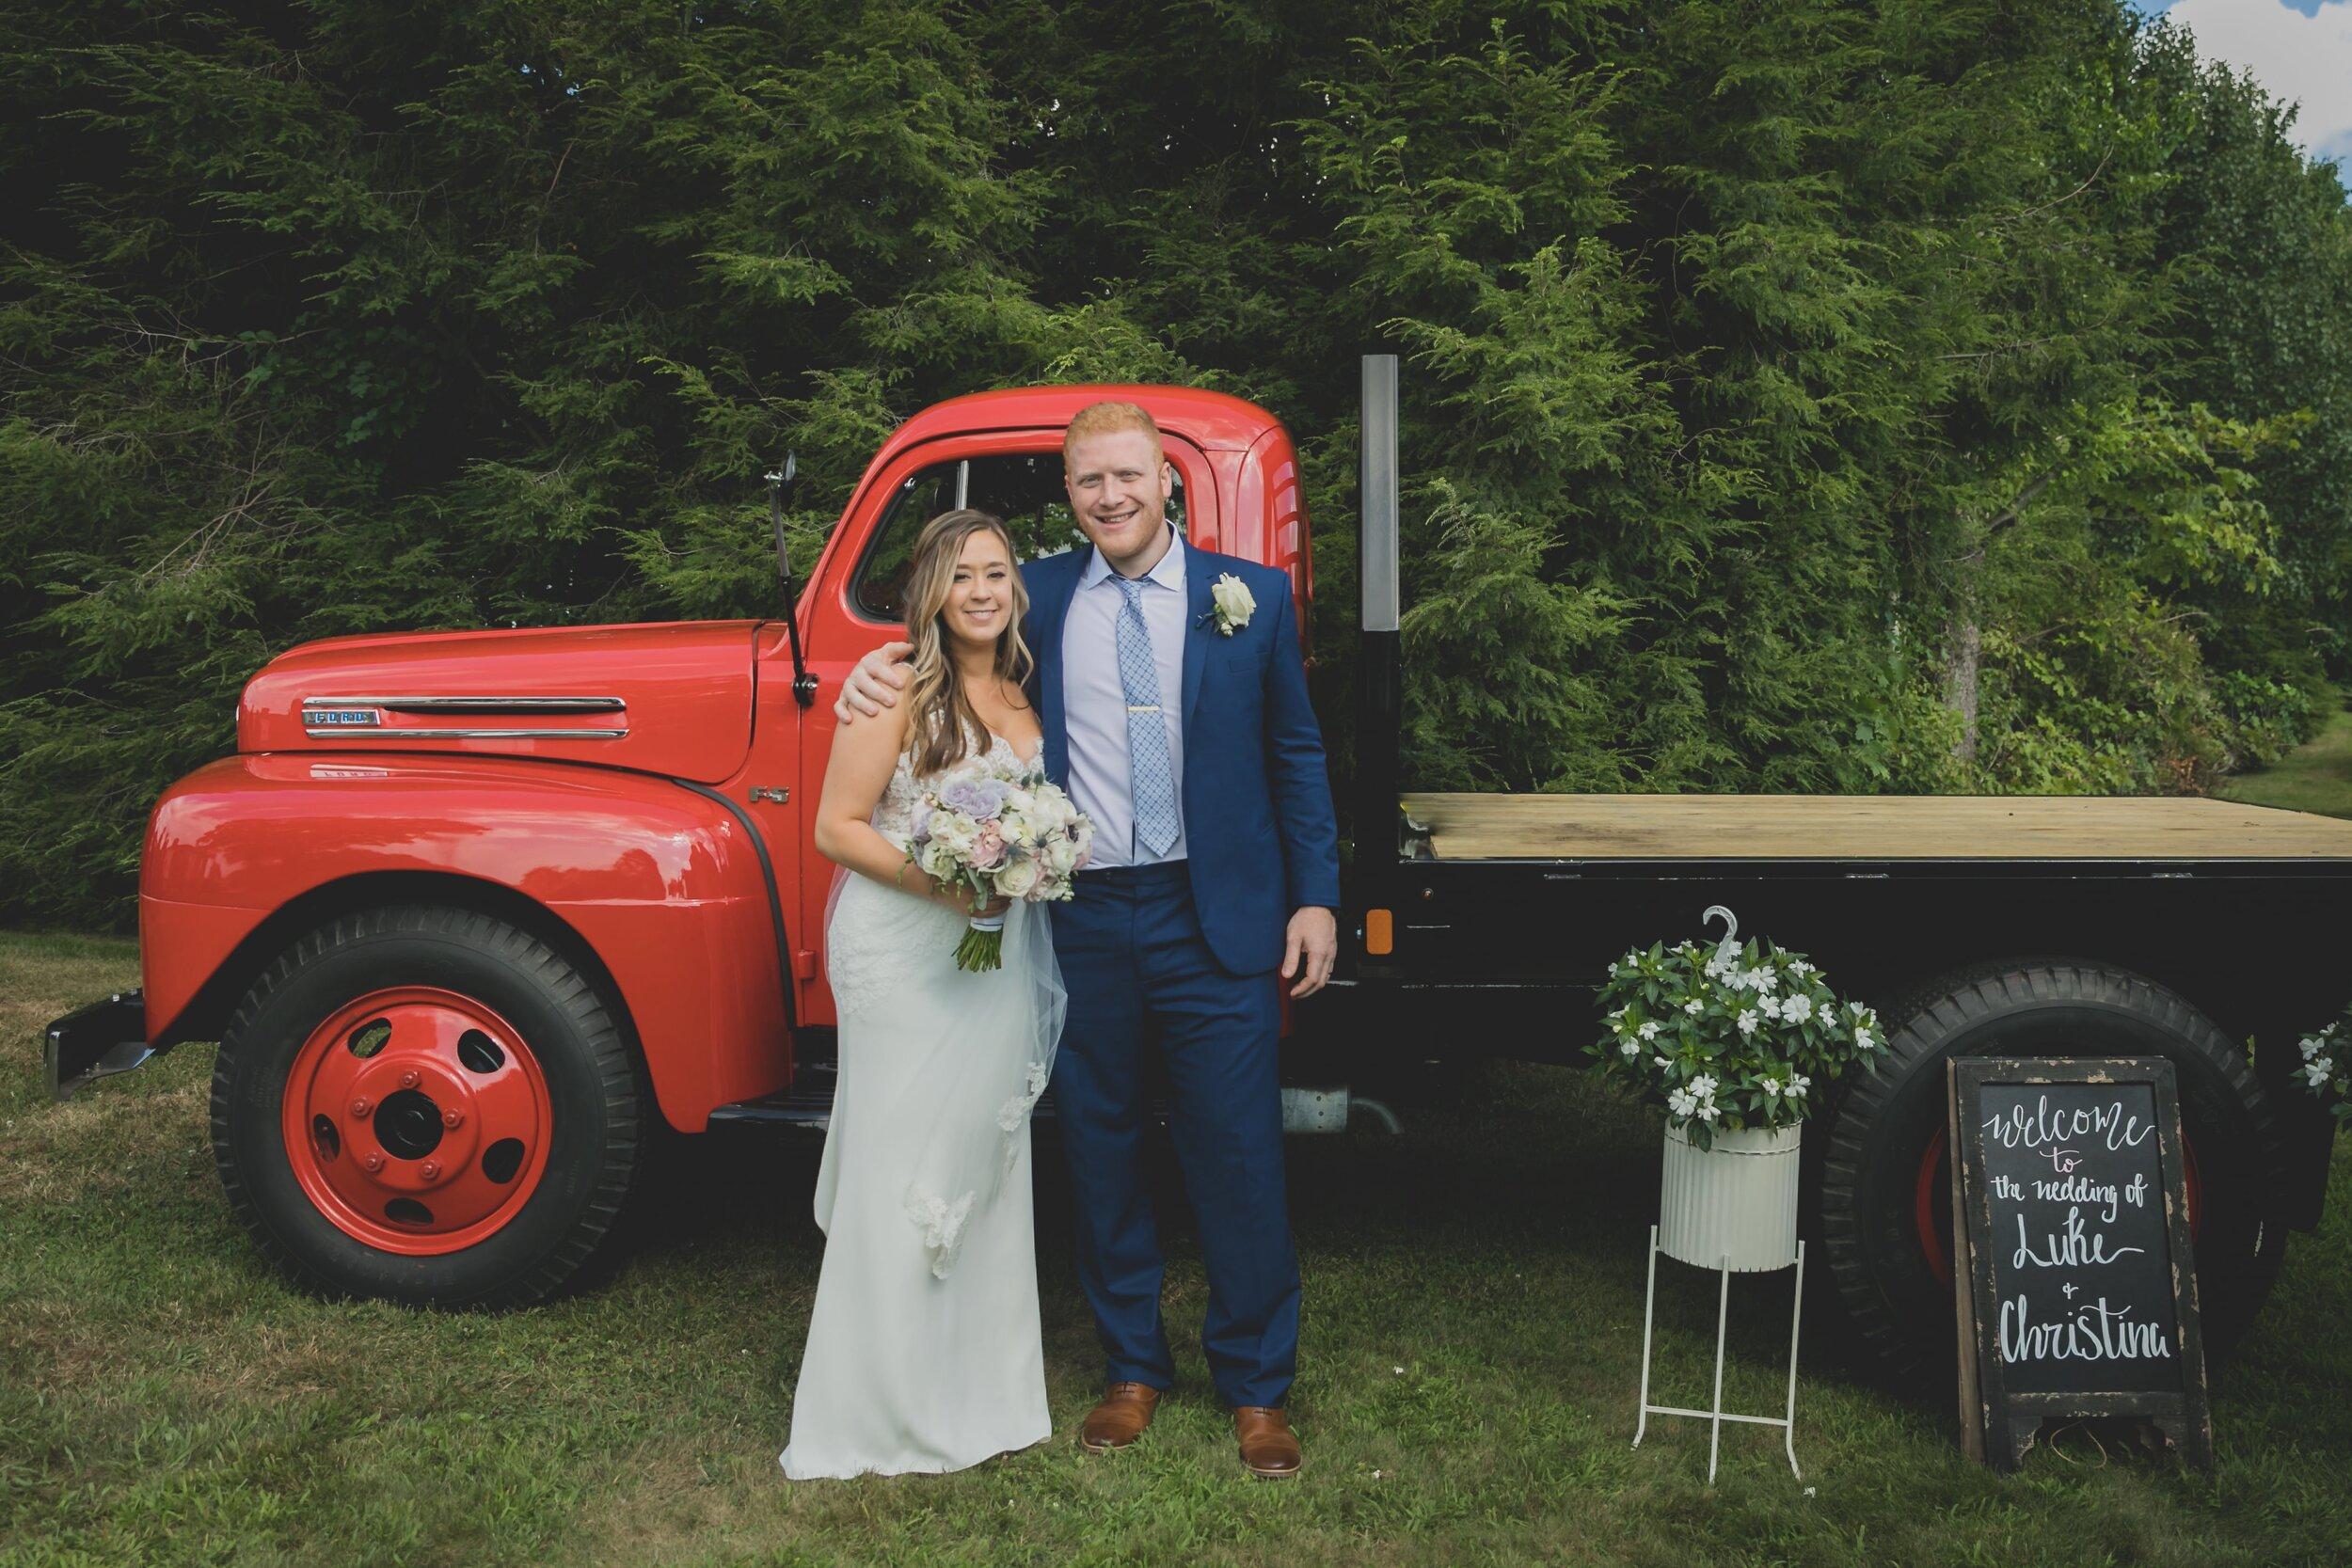 backyard-wedding-ideas-welcome-sign